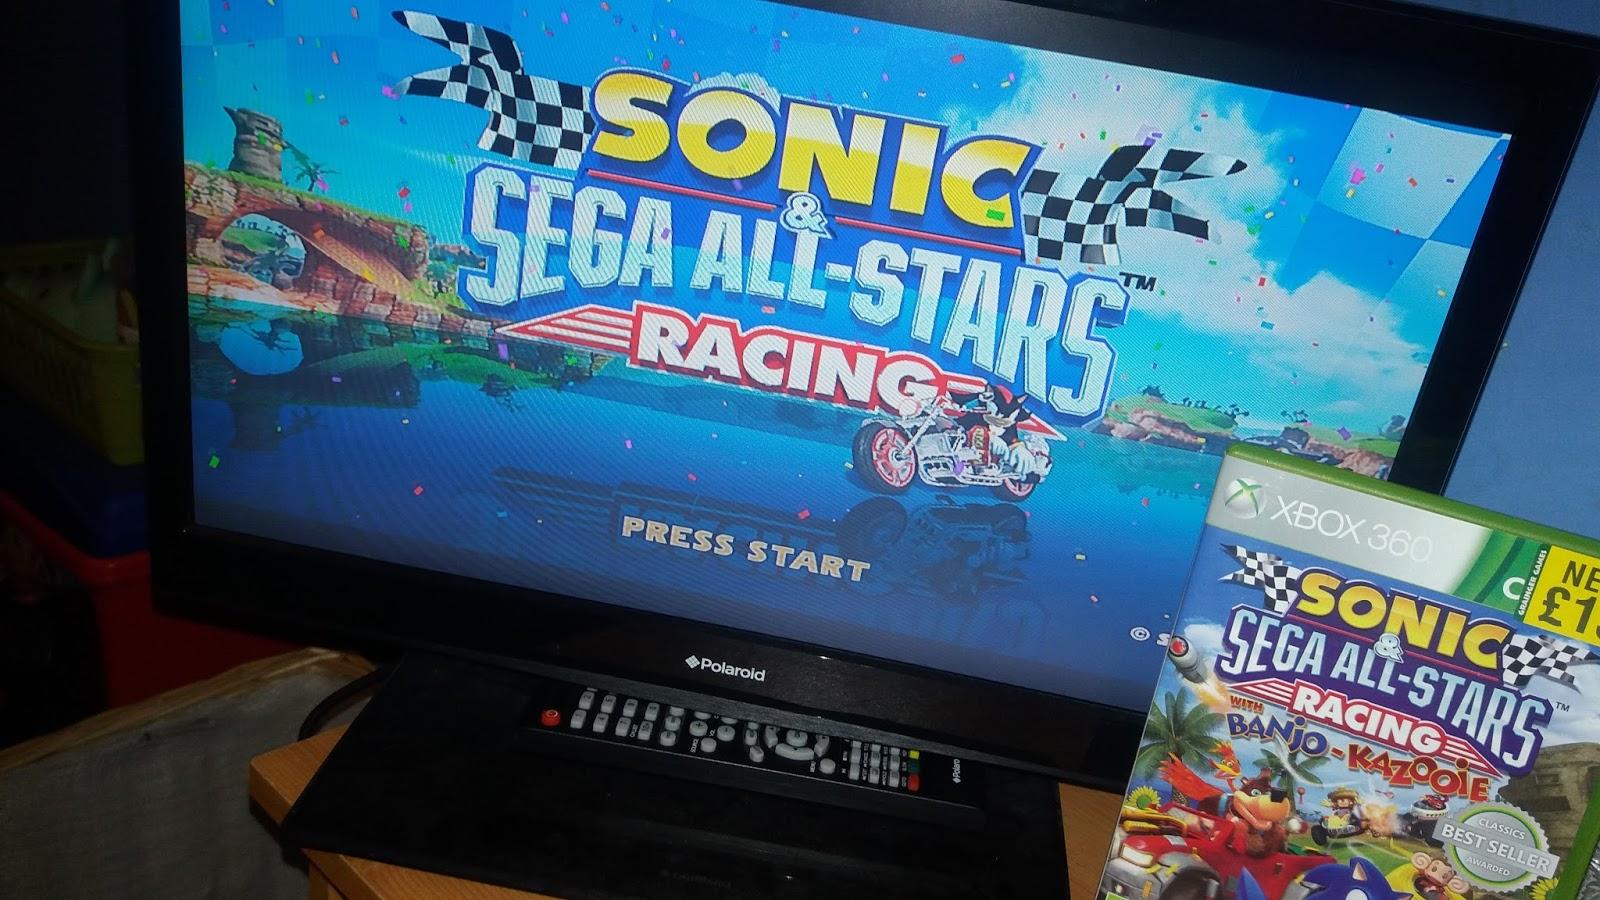 CarsonsCorner: Review of Sonic & Sega All-Stars Racing (XBOX